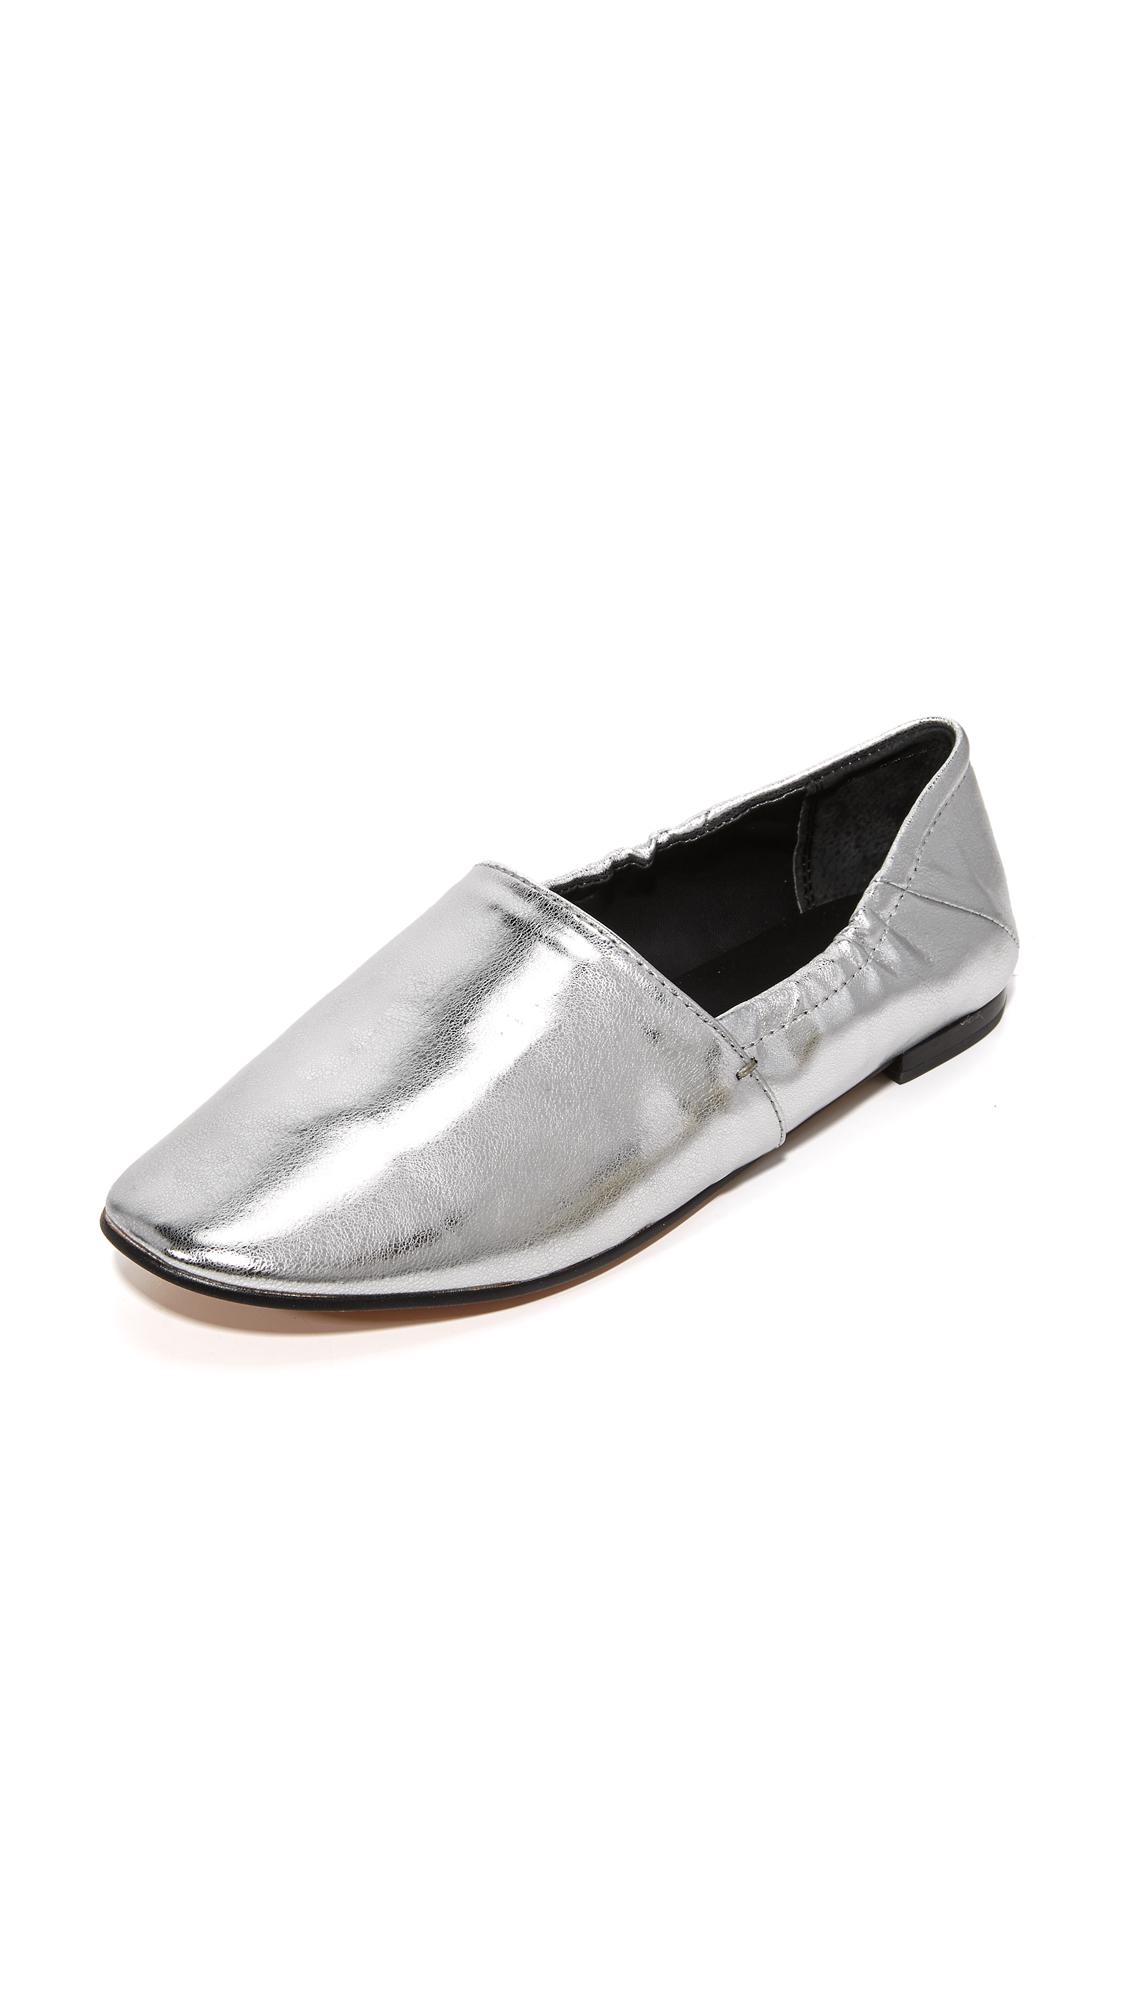 rebecca minkoff female rebecca minkoff romy babouche flats silver metallic